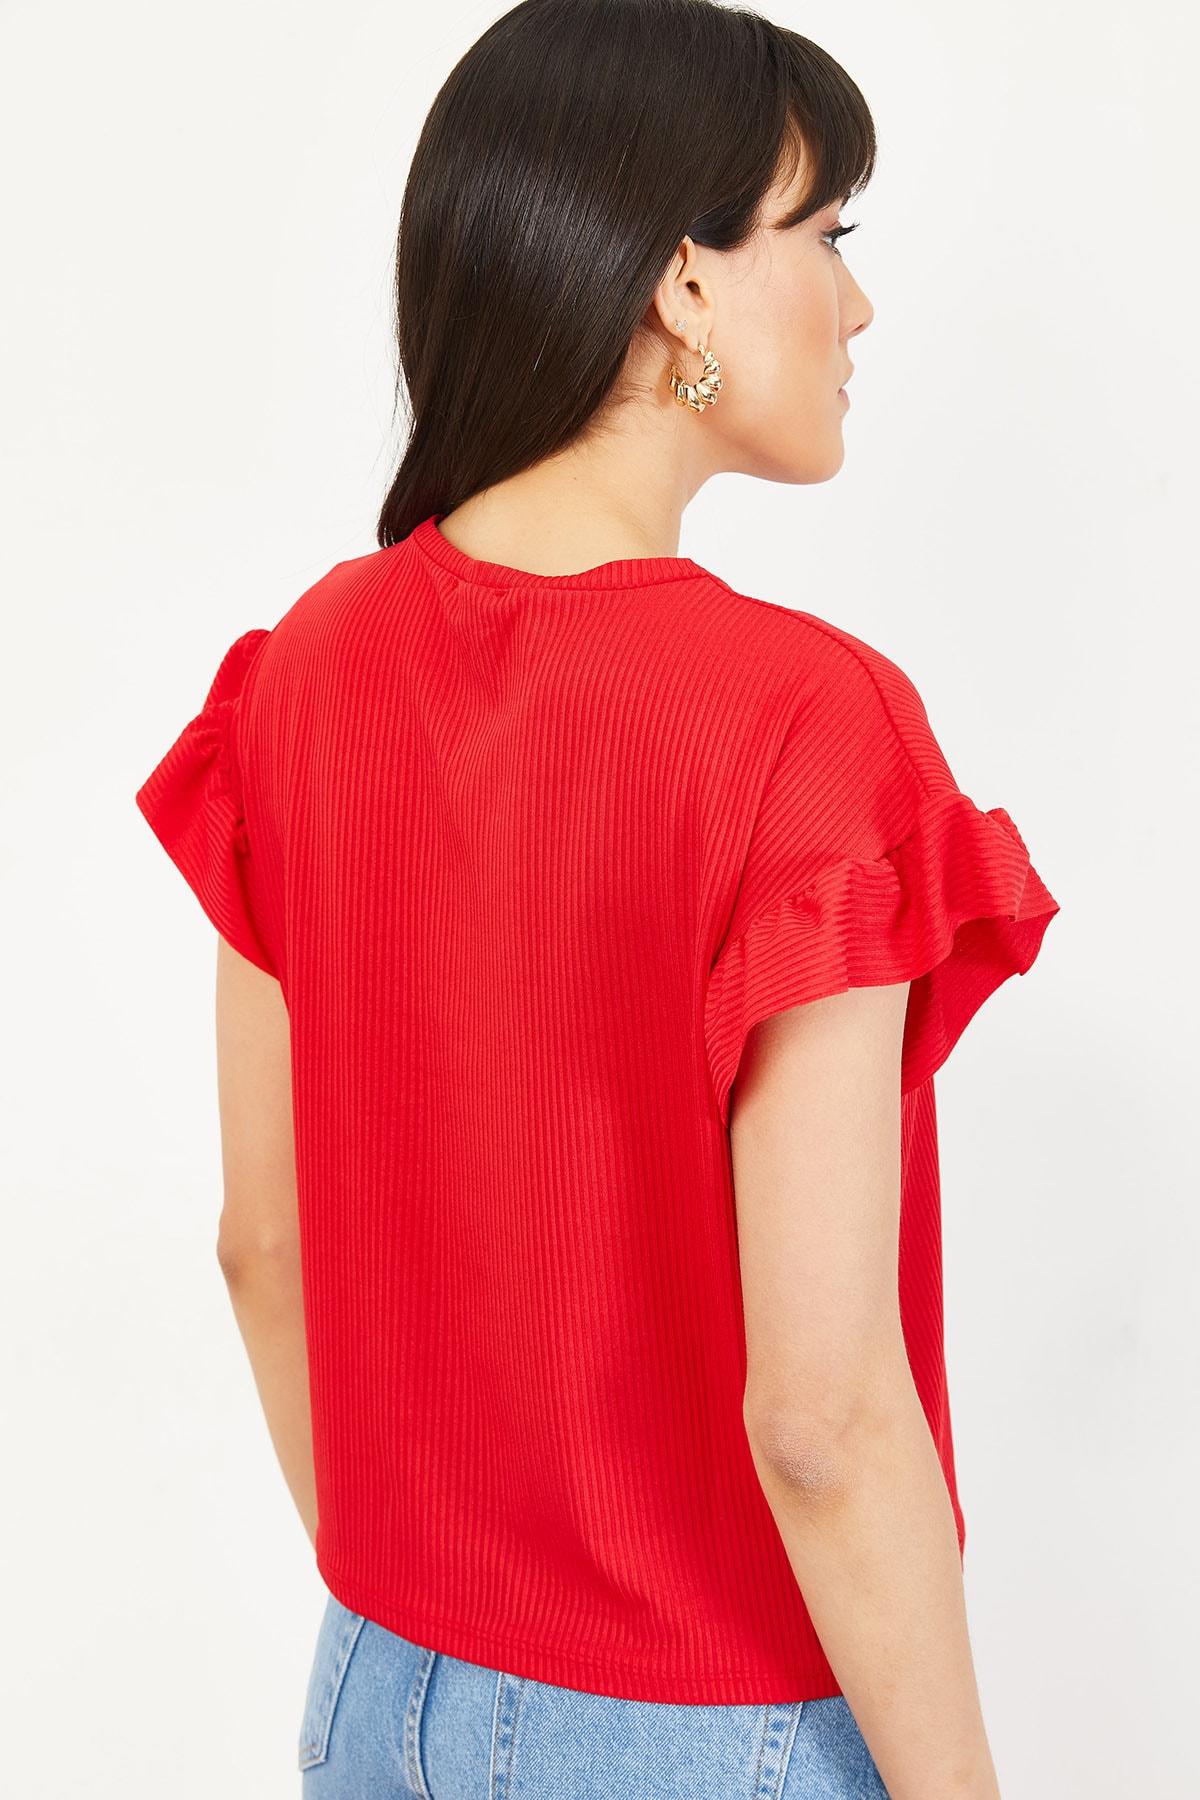 Bianco Lucci Kadın Kırmızı Kolu Fırfırlı Kaşkorse Bluz 10051015 1